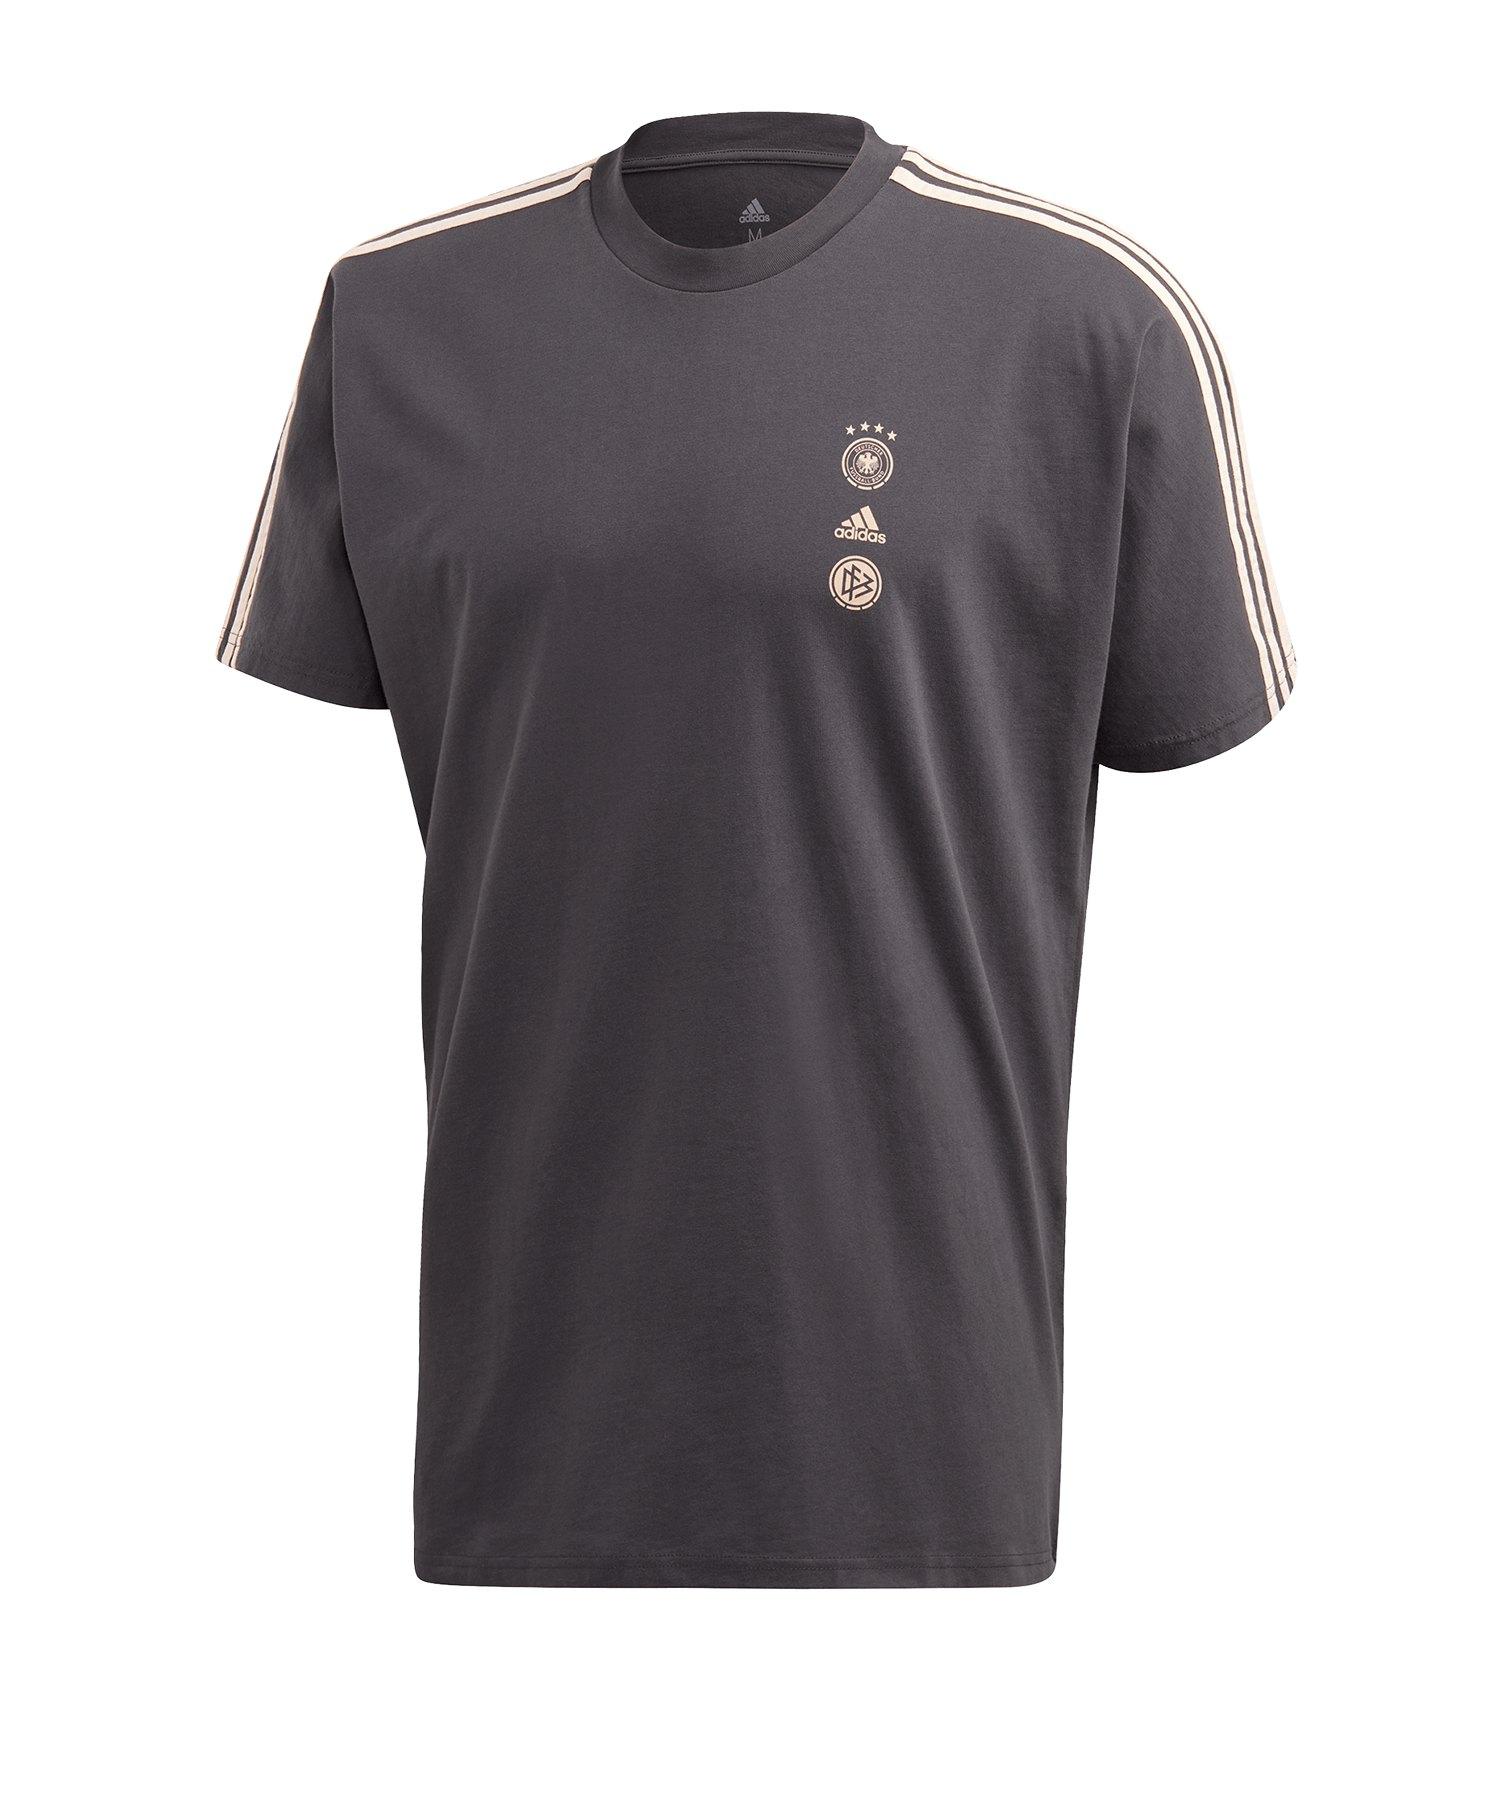 adidas DFB Deutschland SSP Tee T-Shirt Grau - grau